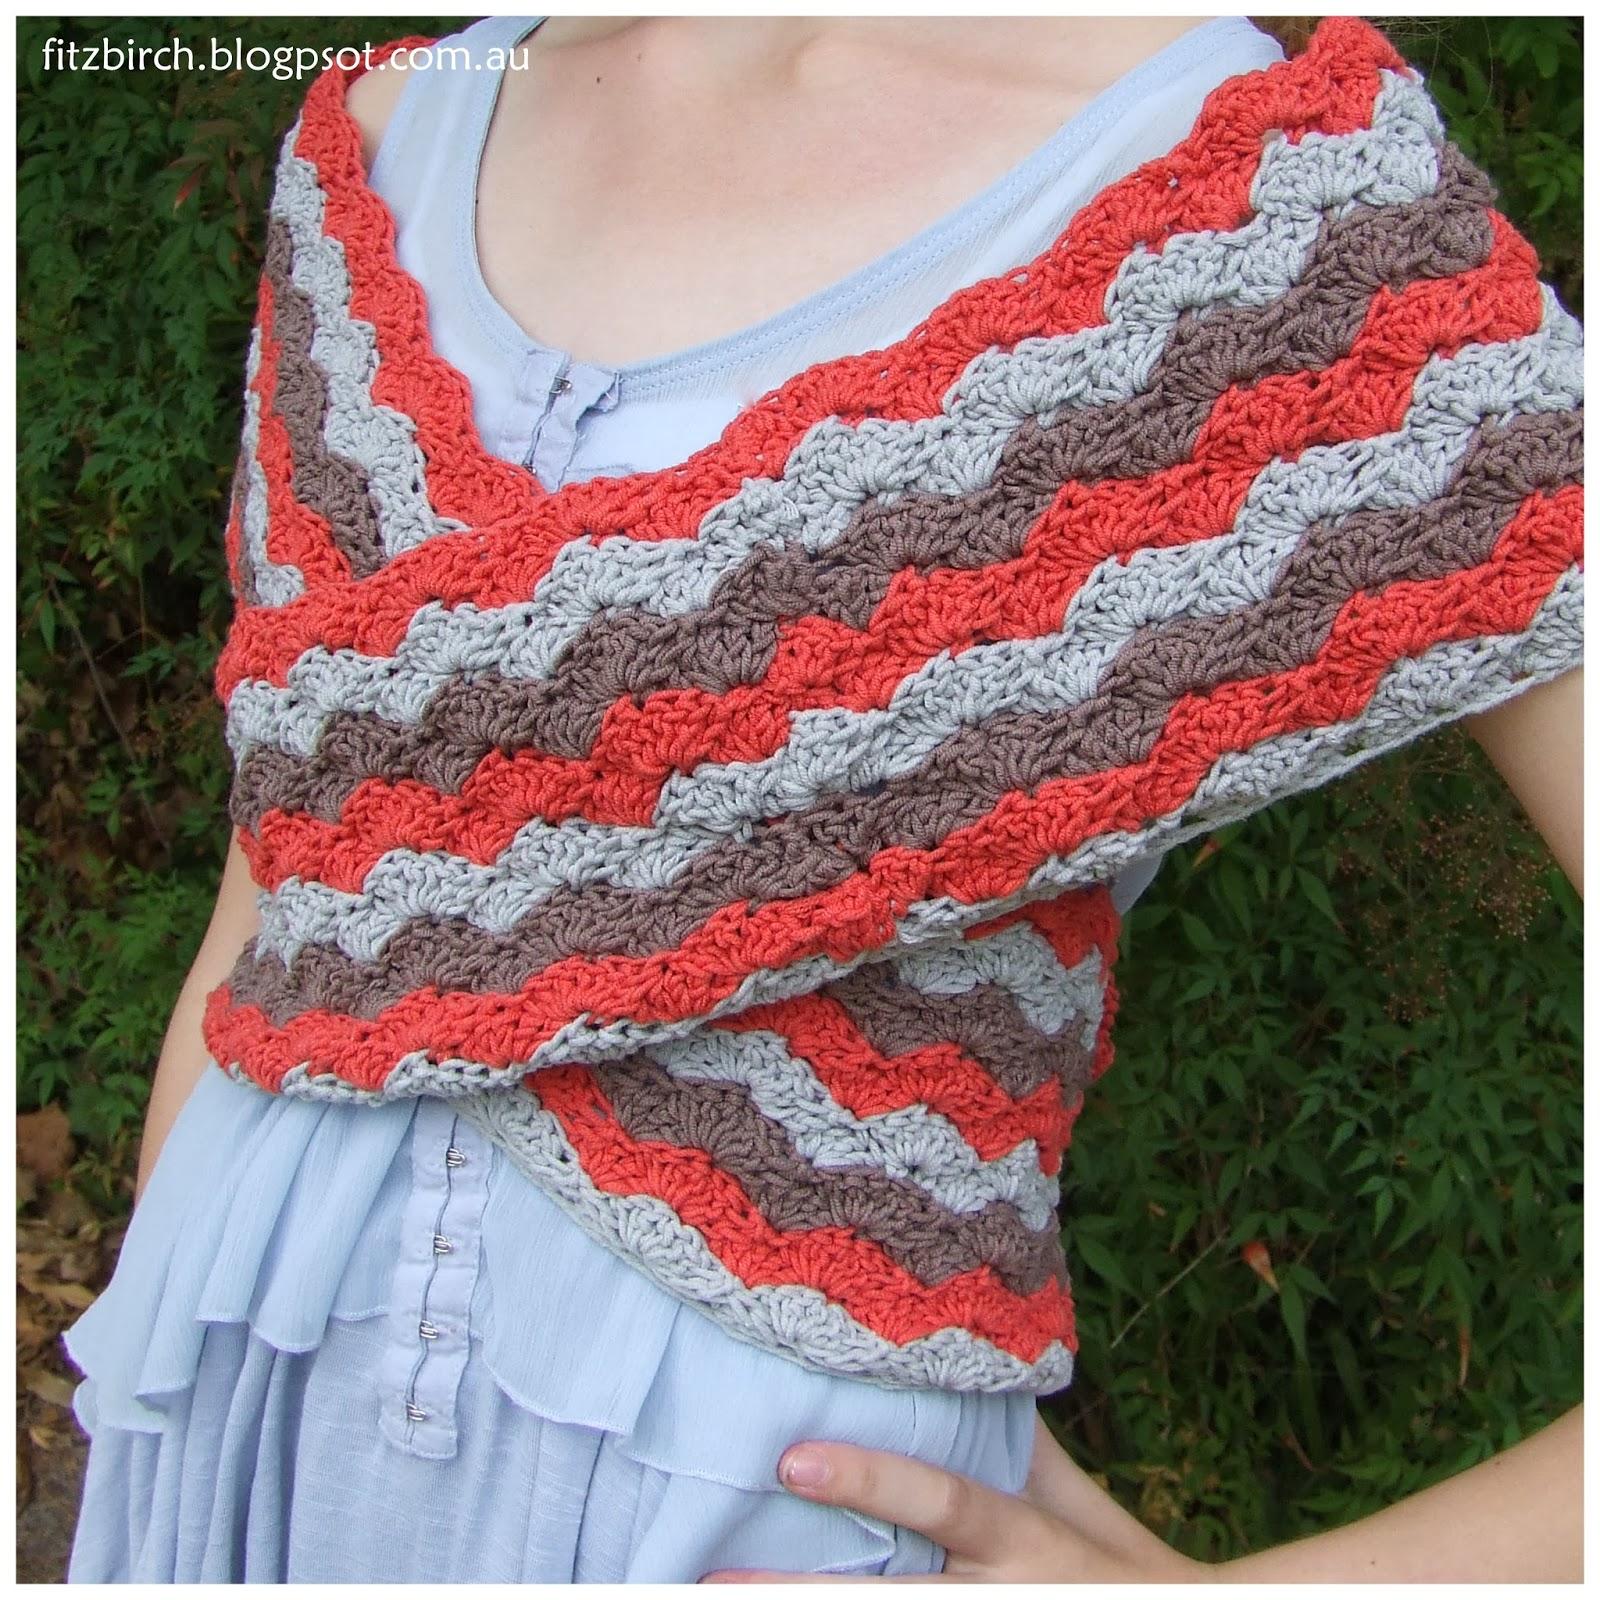 Free Crochet Pattern Ballet Wrap : FitzBirch Crafts: Free Crochet Patterns